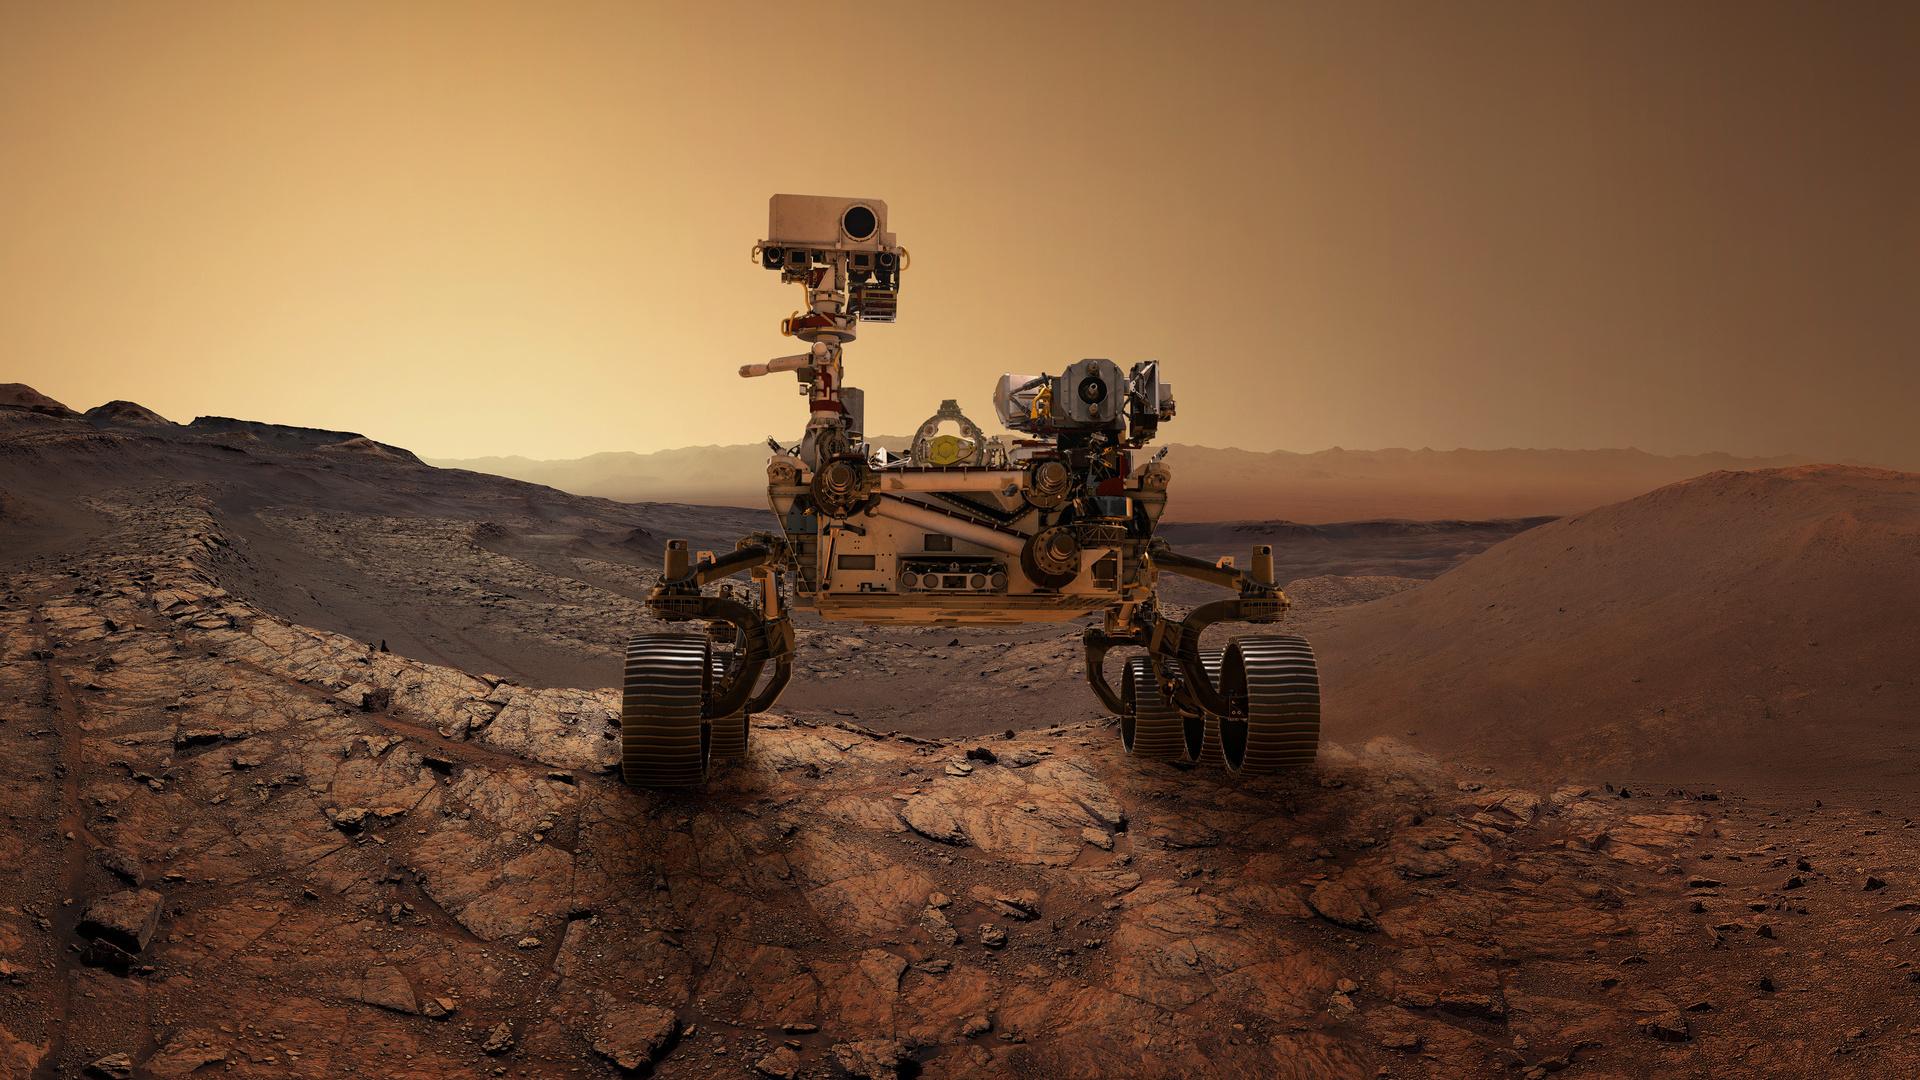 Mars 2020 Perseverance, supercam